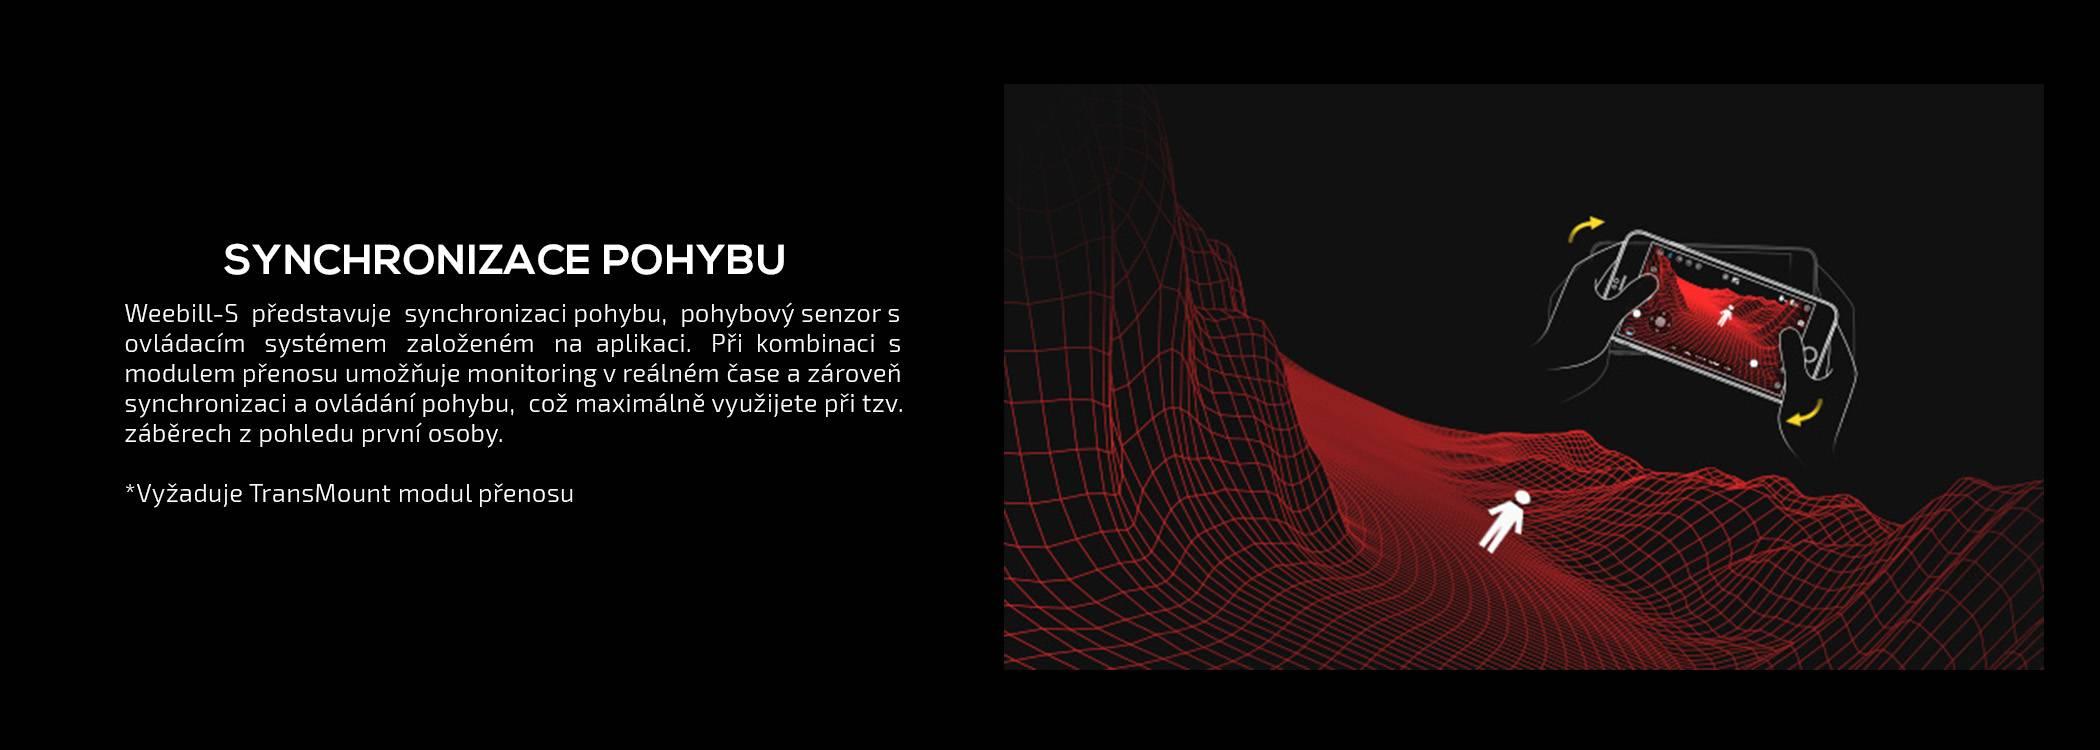 film-technika-zhiyun-weebill-s-synchronizace